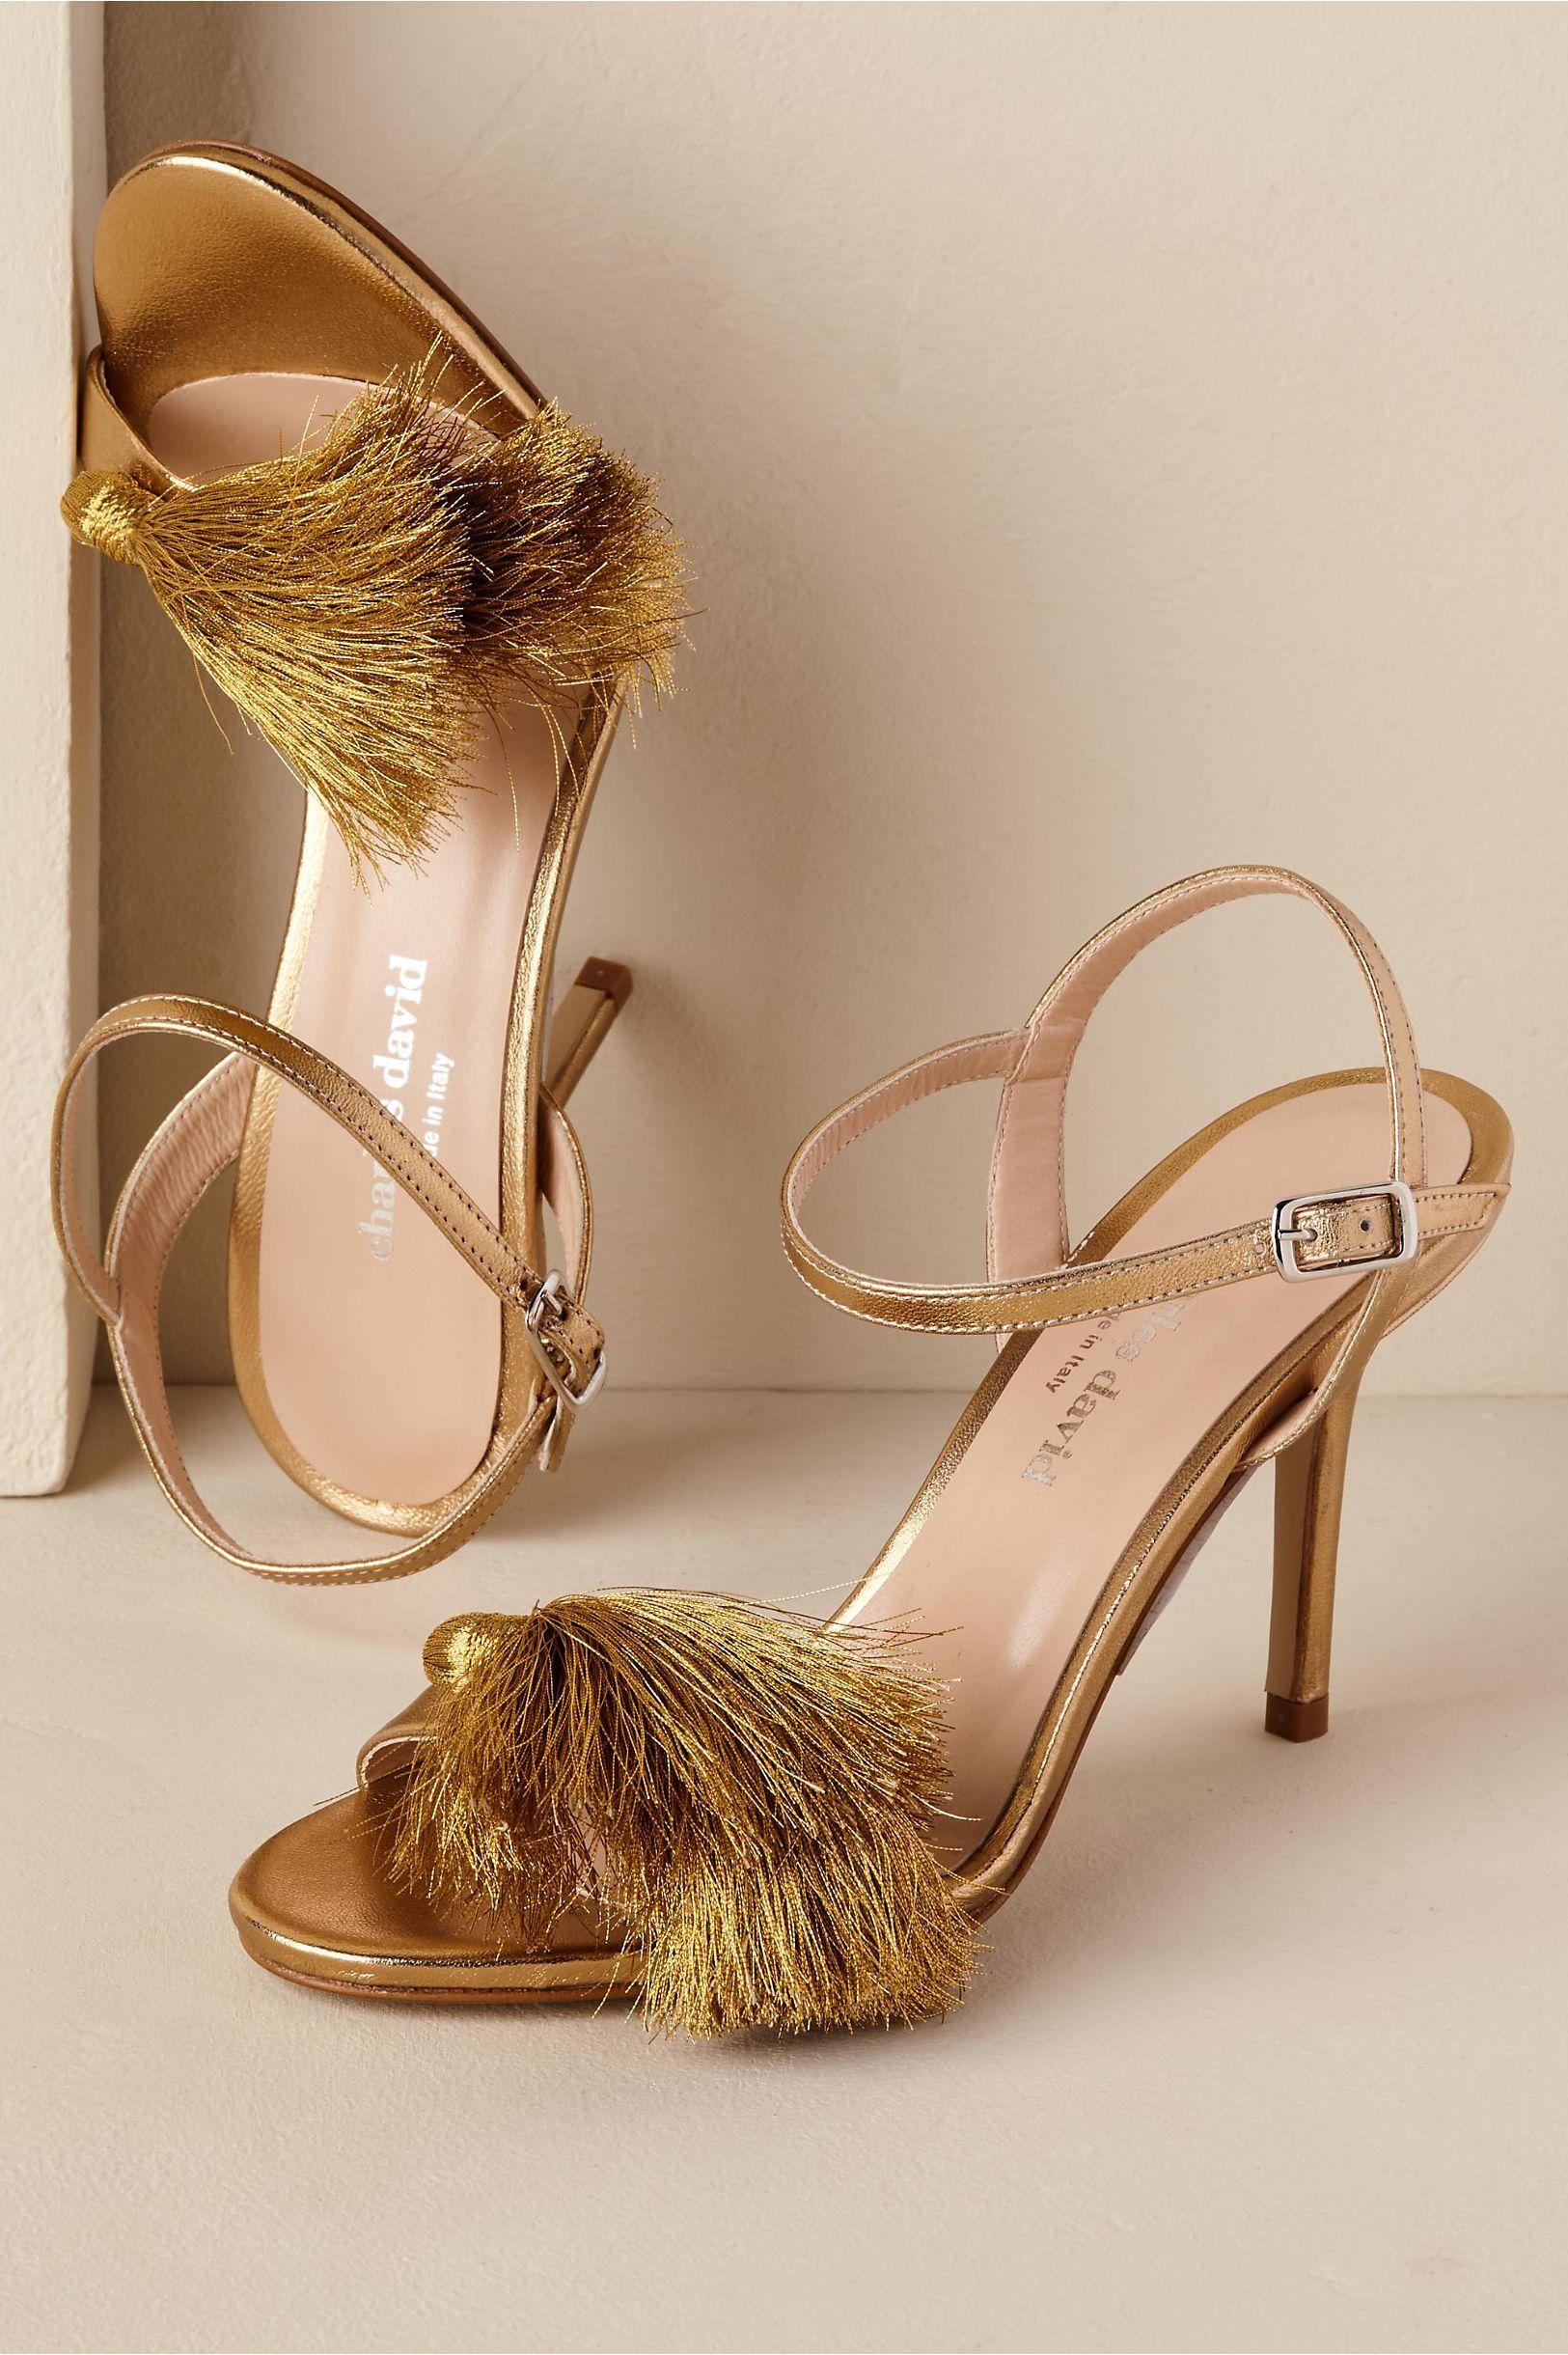 Missguided Feather Heels | Feather heels, Heels